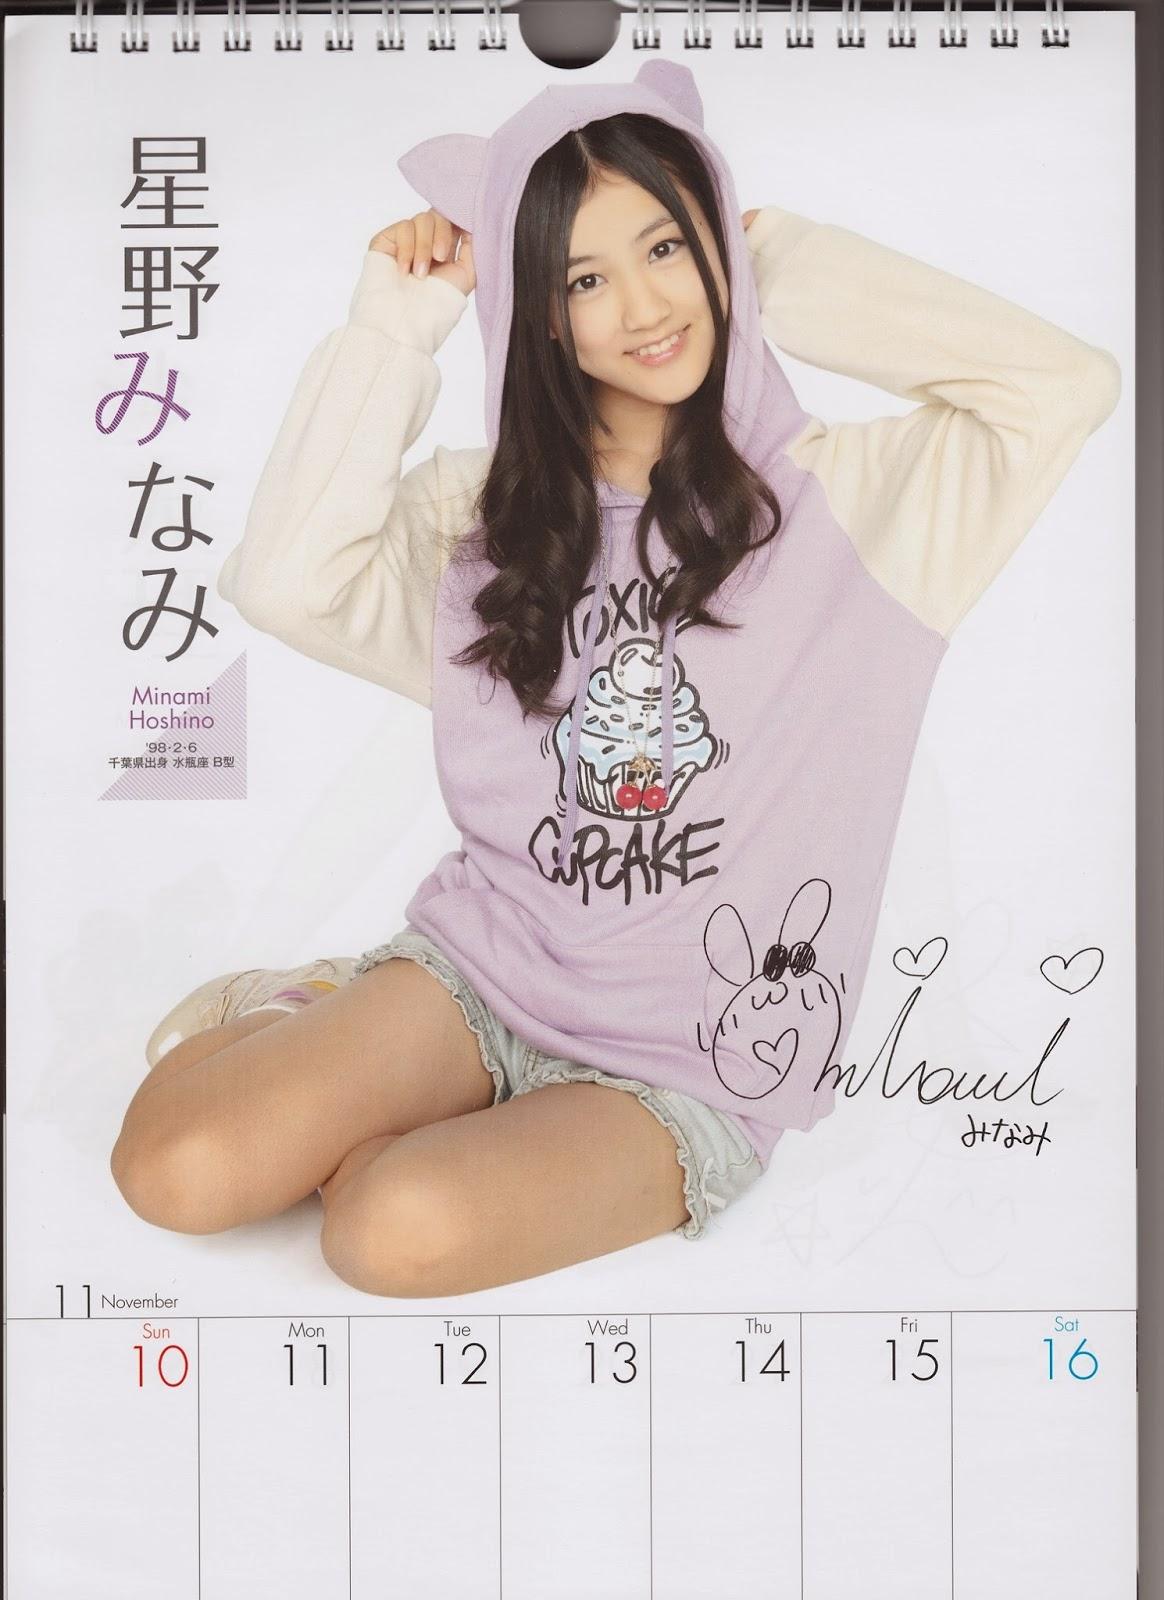 Nao Kanzaki and a few friends: Nogizaka46: The Mai